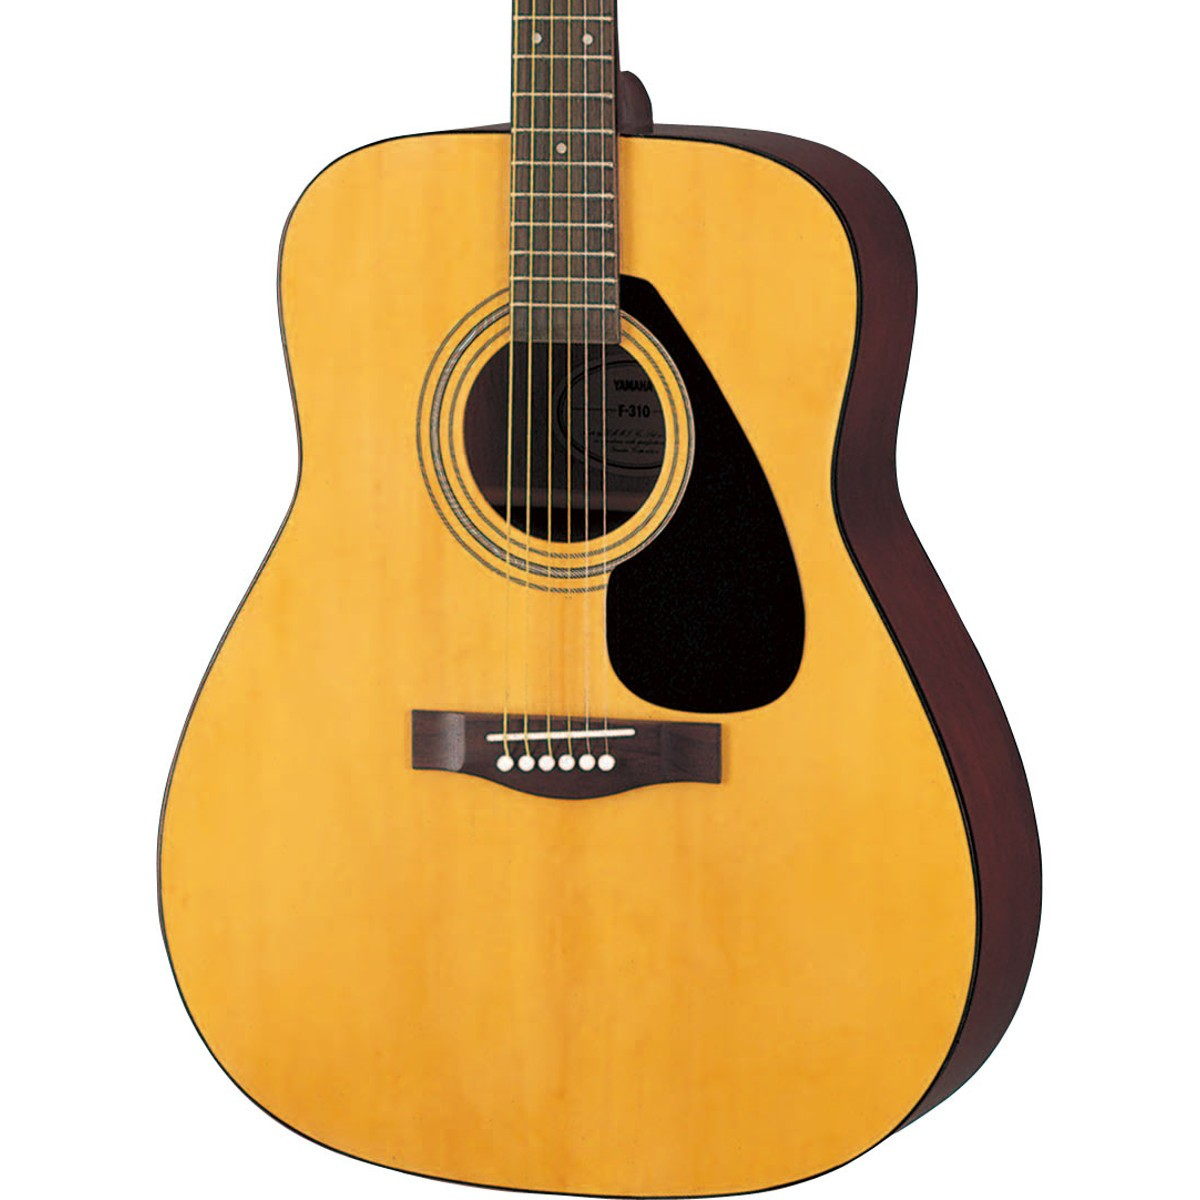 Yamaha f310 acoustic guitar in natural finish yamaha for Yamaha fs 310 guitar